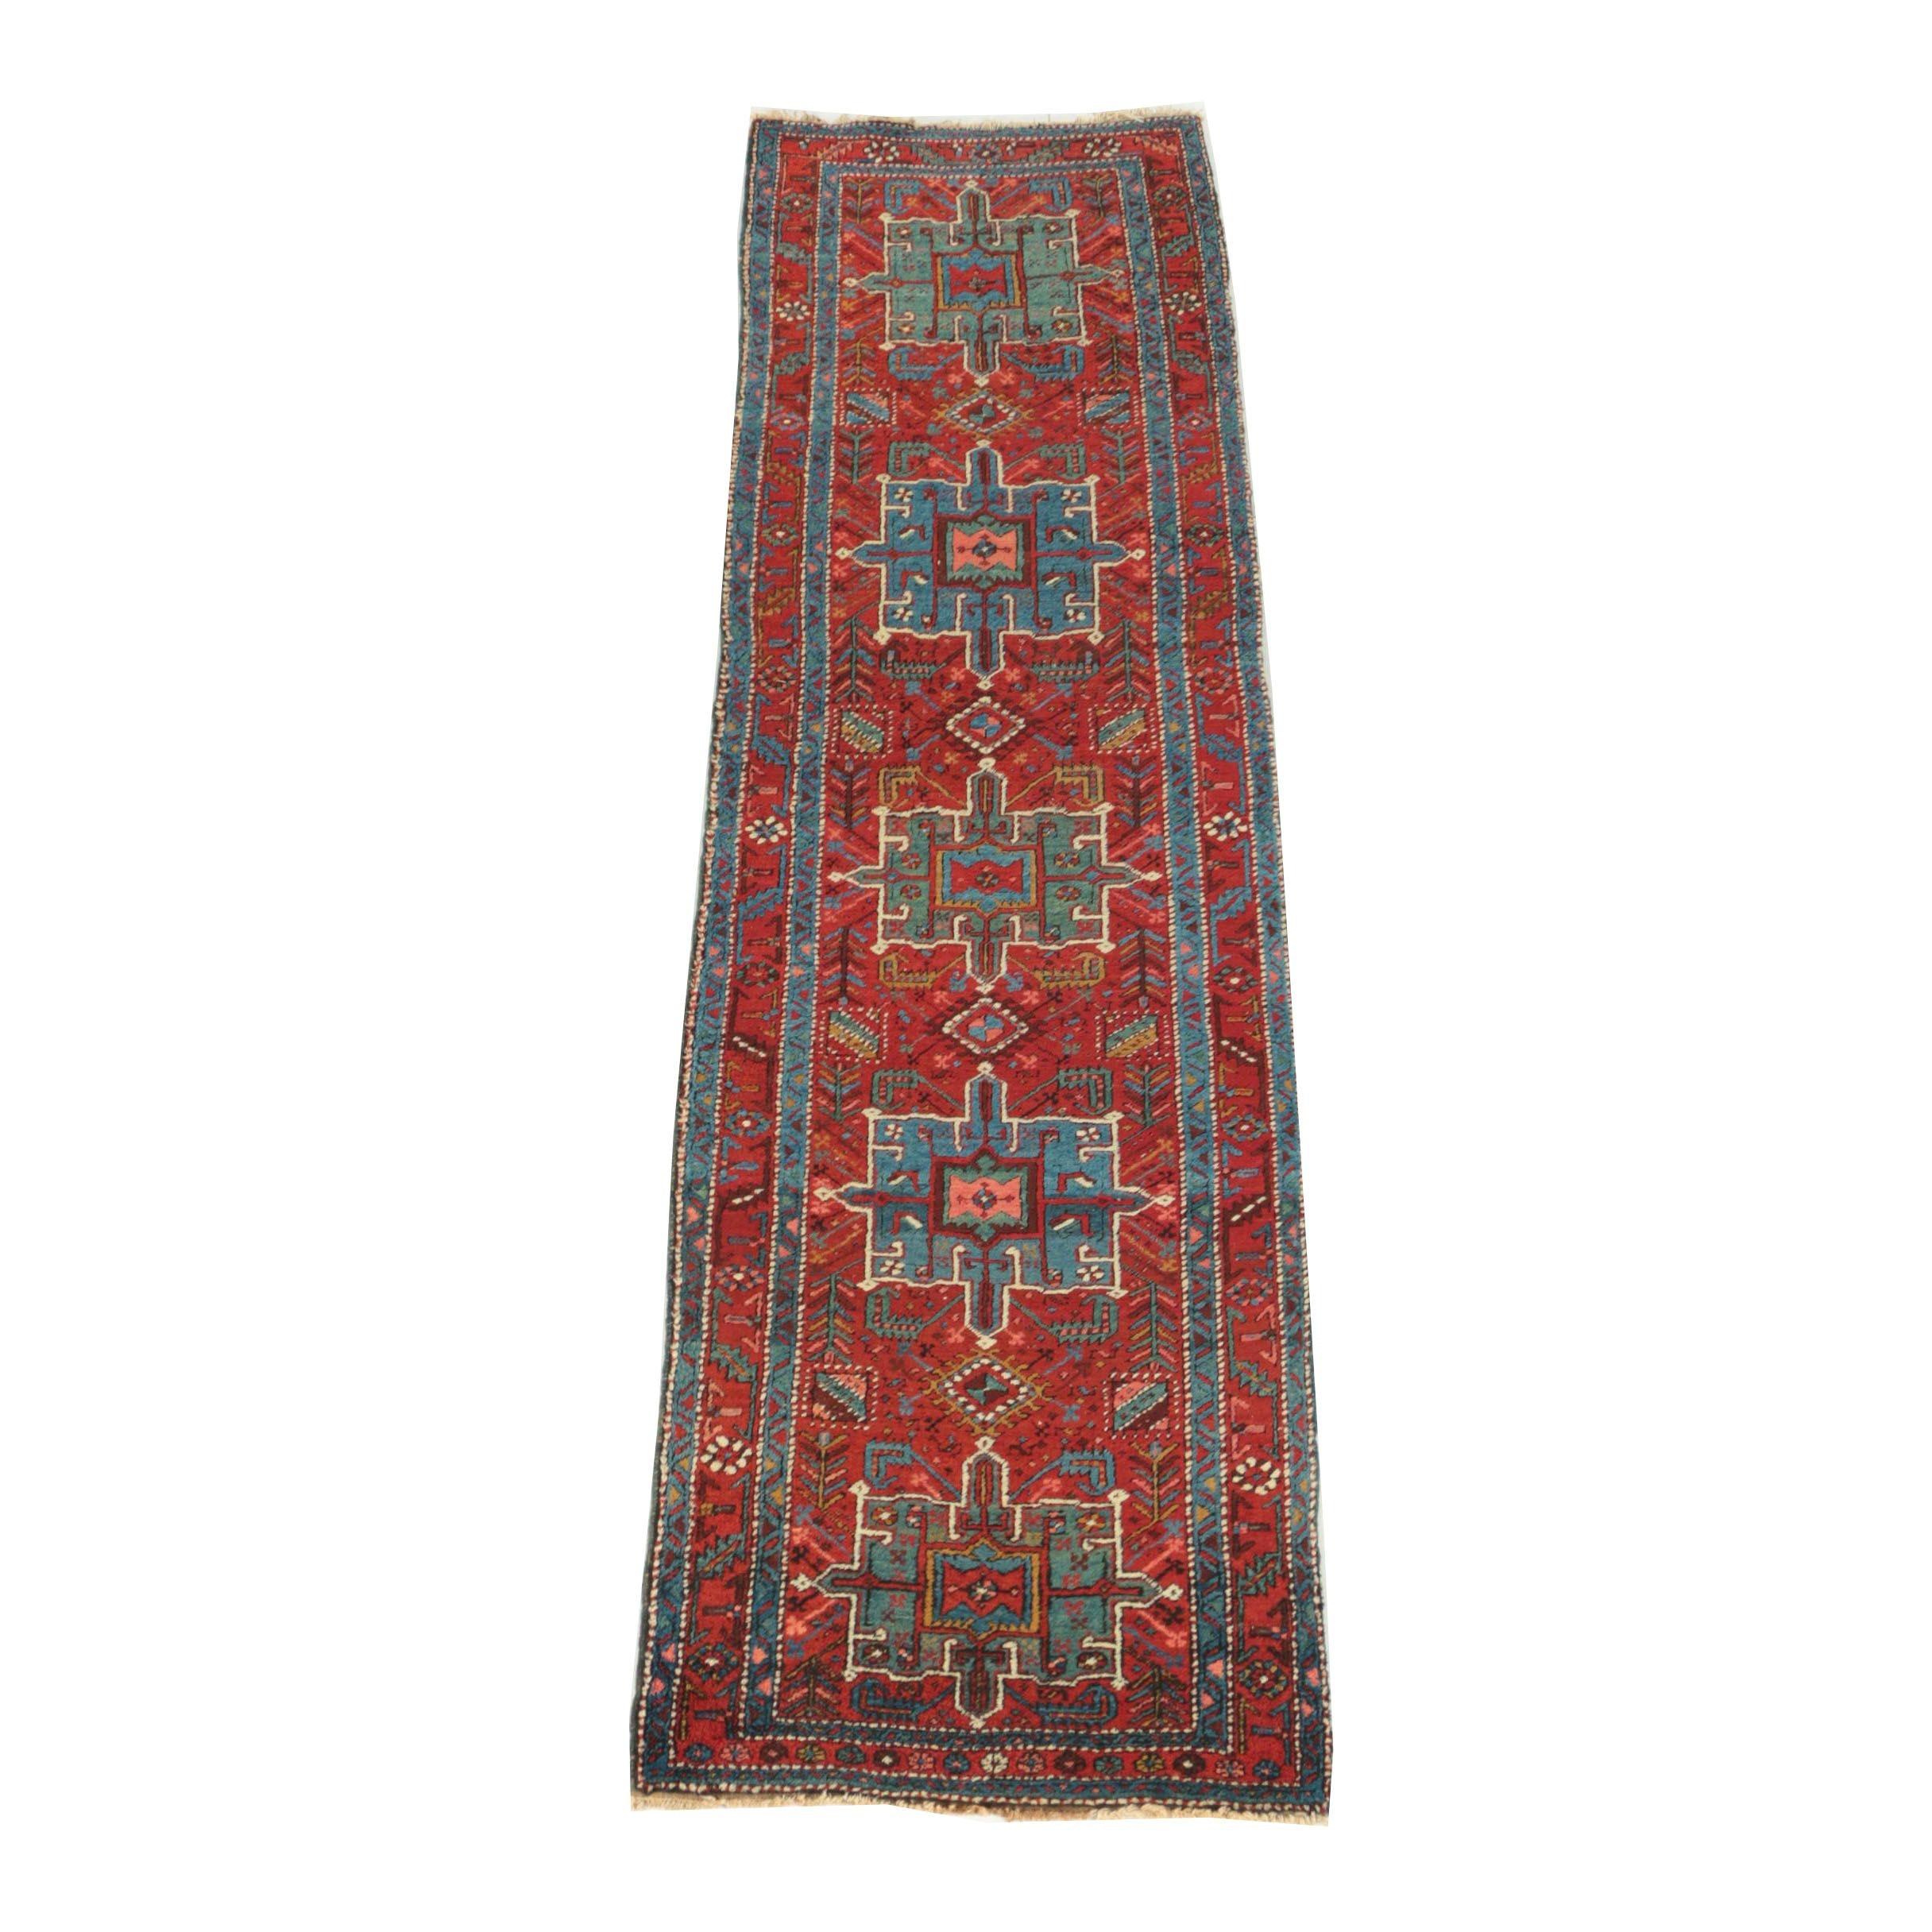 Vintage Hand-Knotted Persian Heriz Karaja Wool Carpet Runner